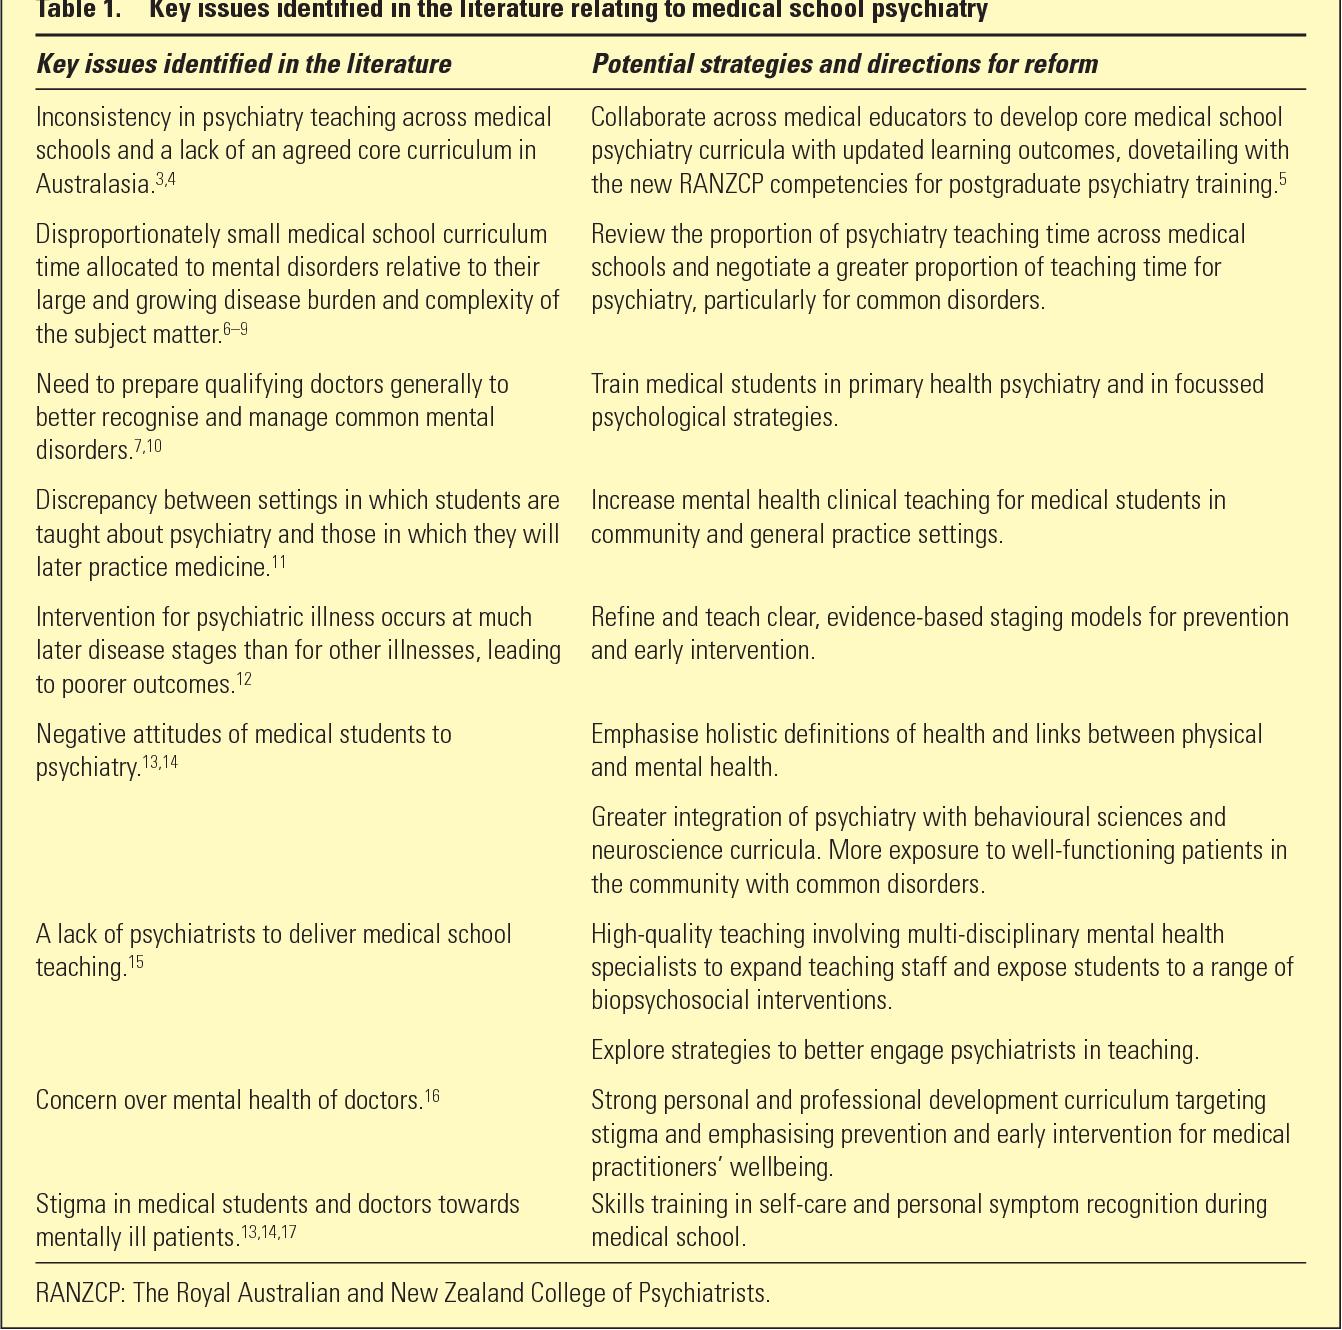 Updating medical school psychiatry curricula to meet